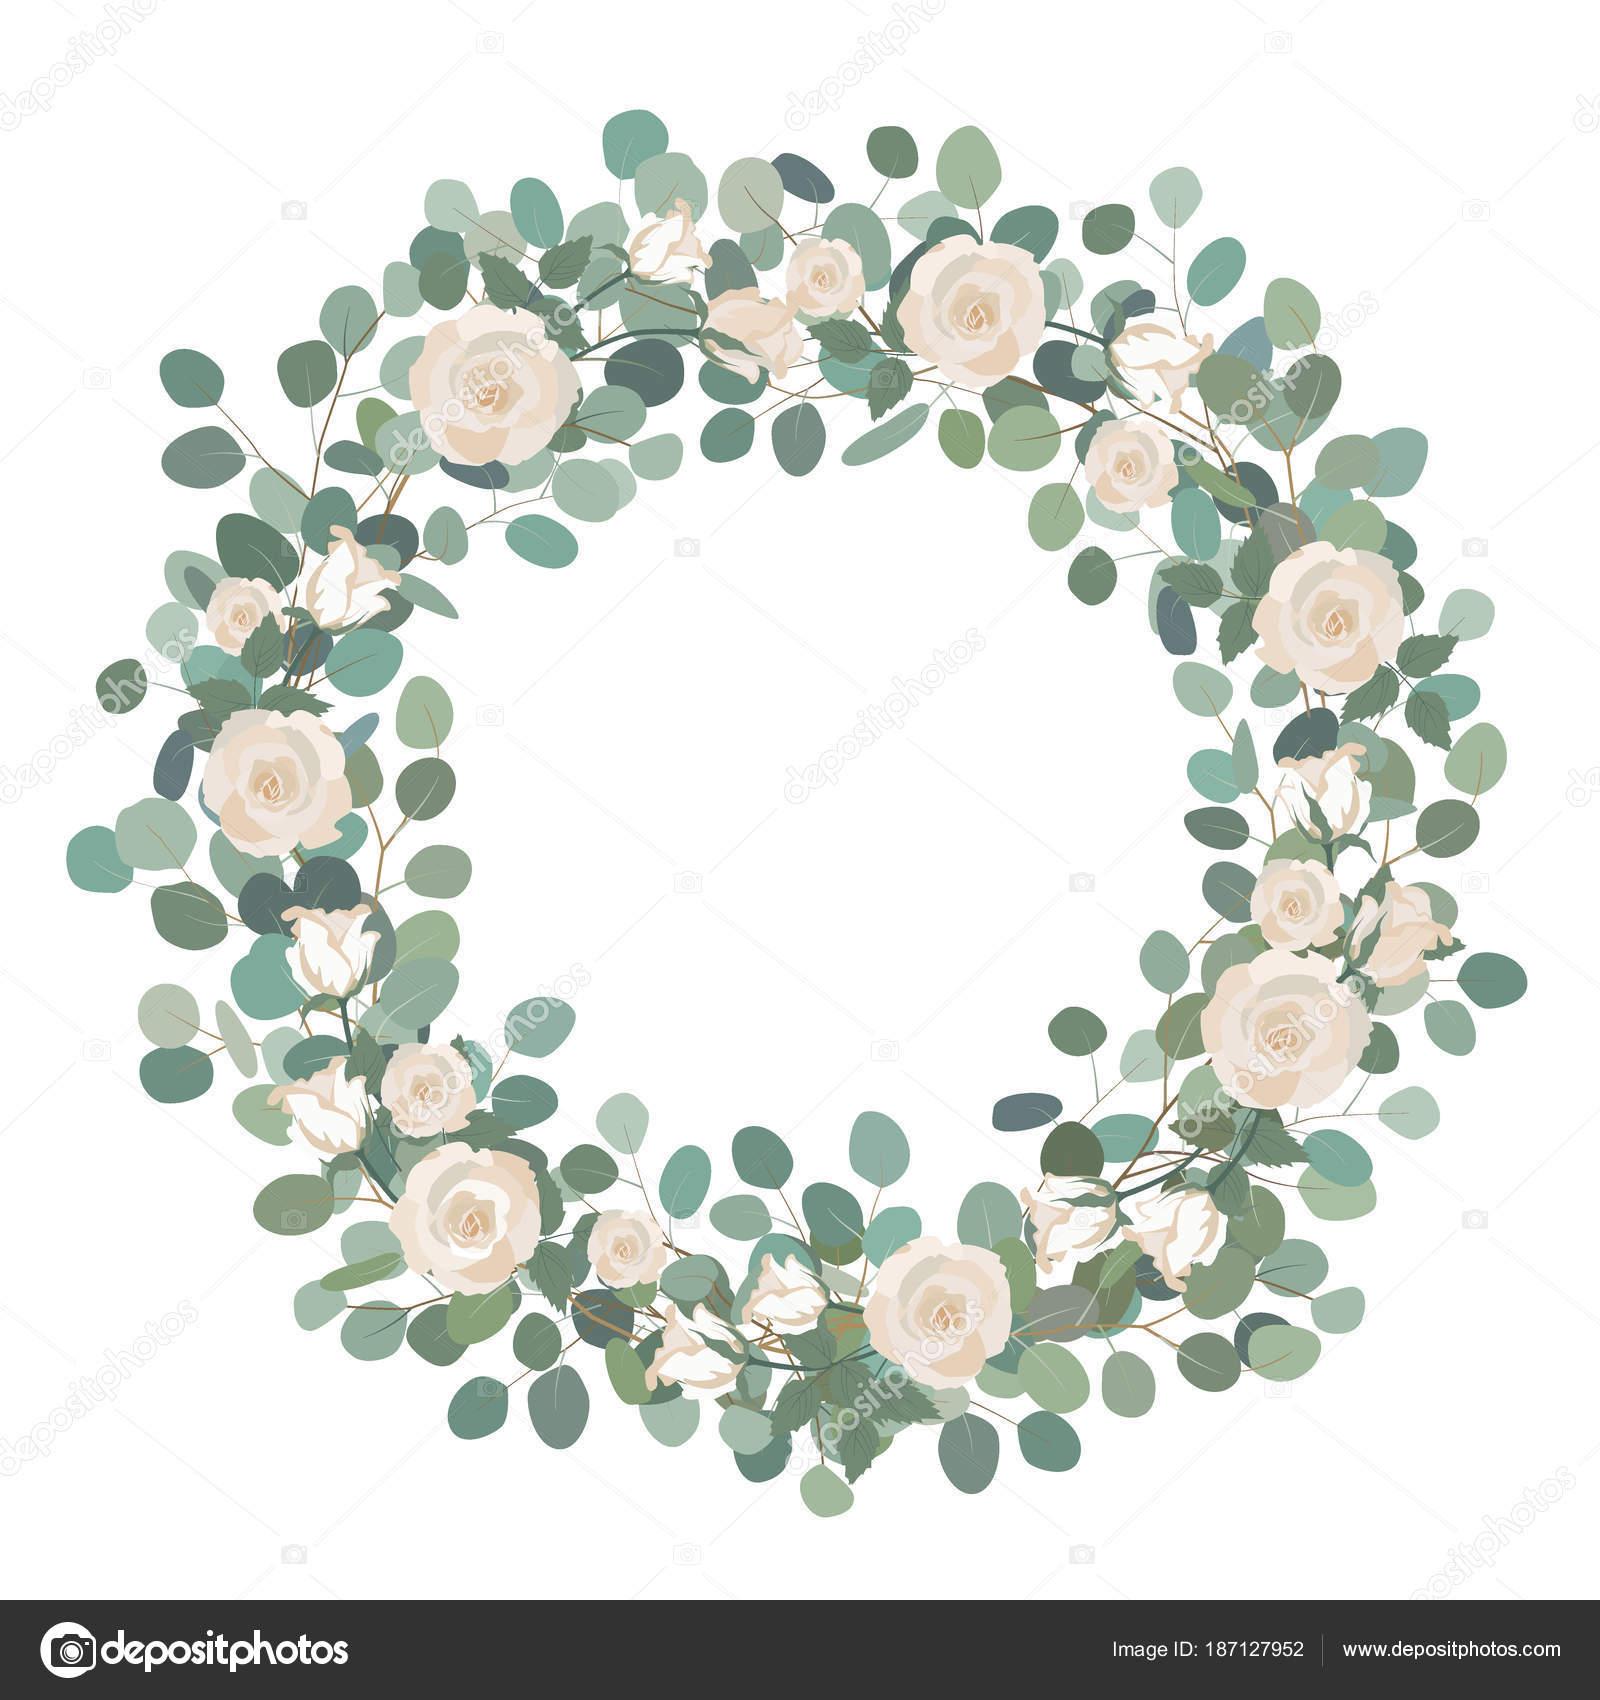 White Rose Flowers And Silver Dollar Eucalyptus Garland Round Wreath Greeting Wedding Invite